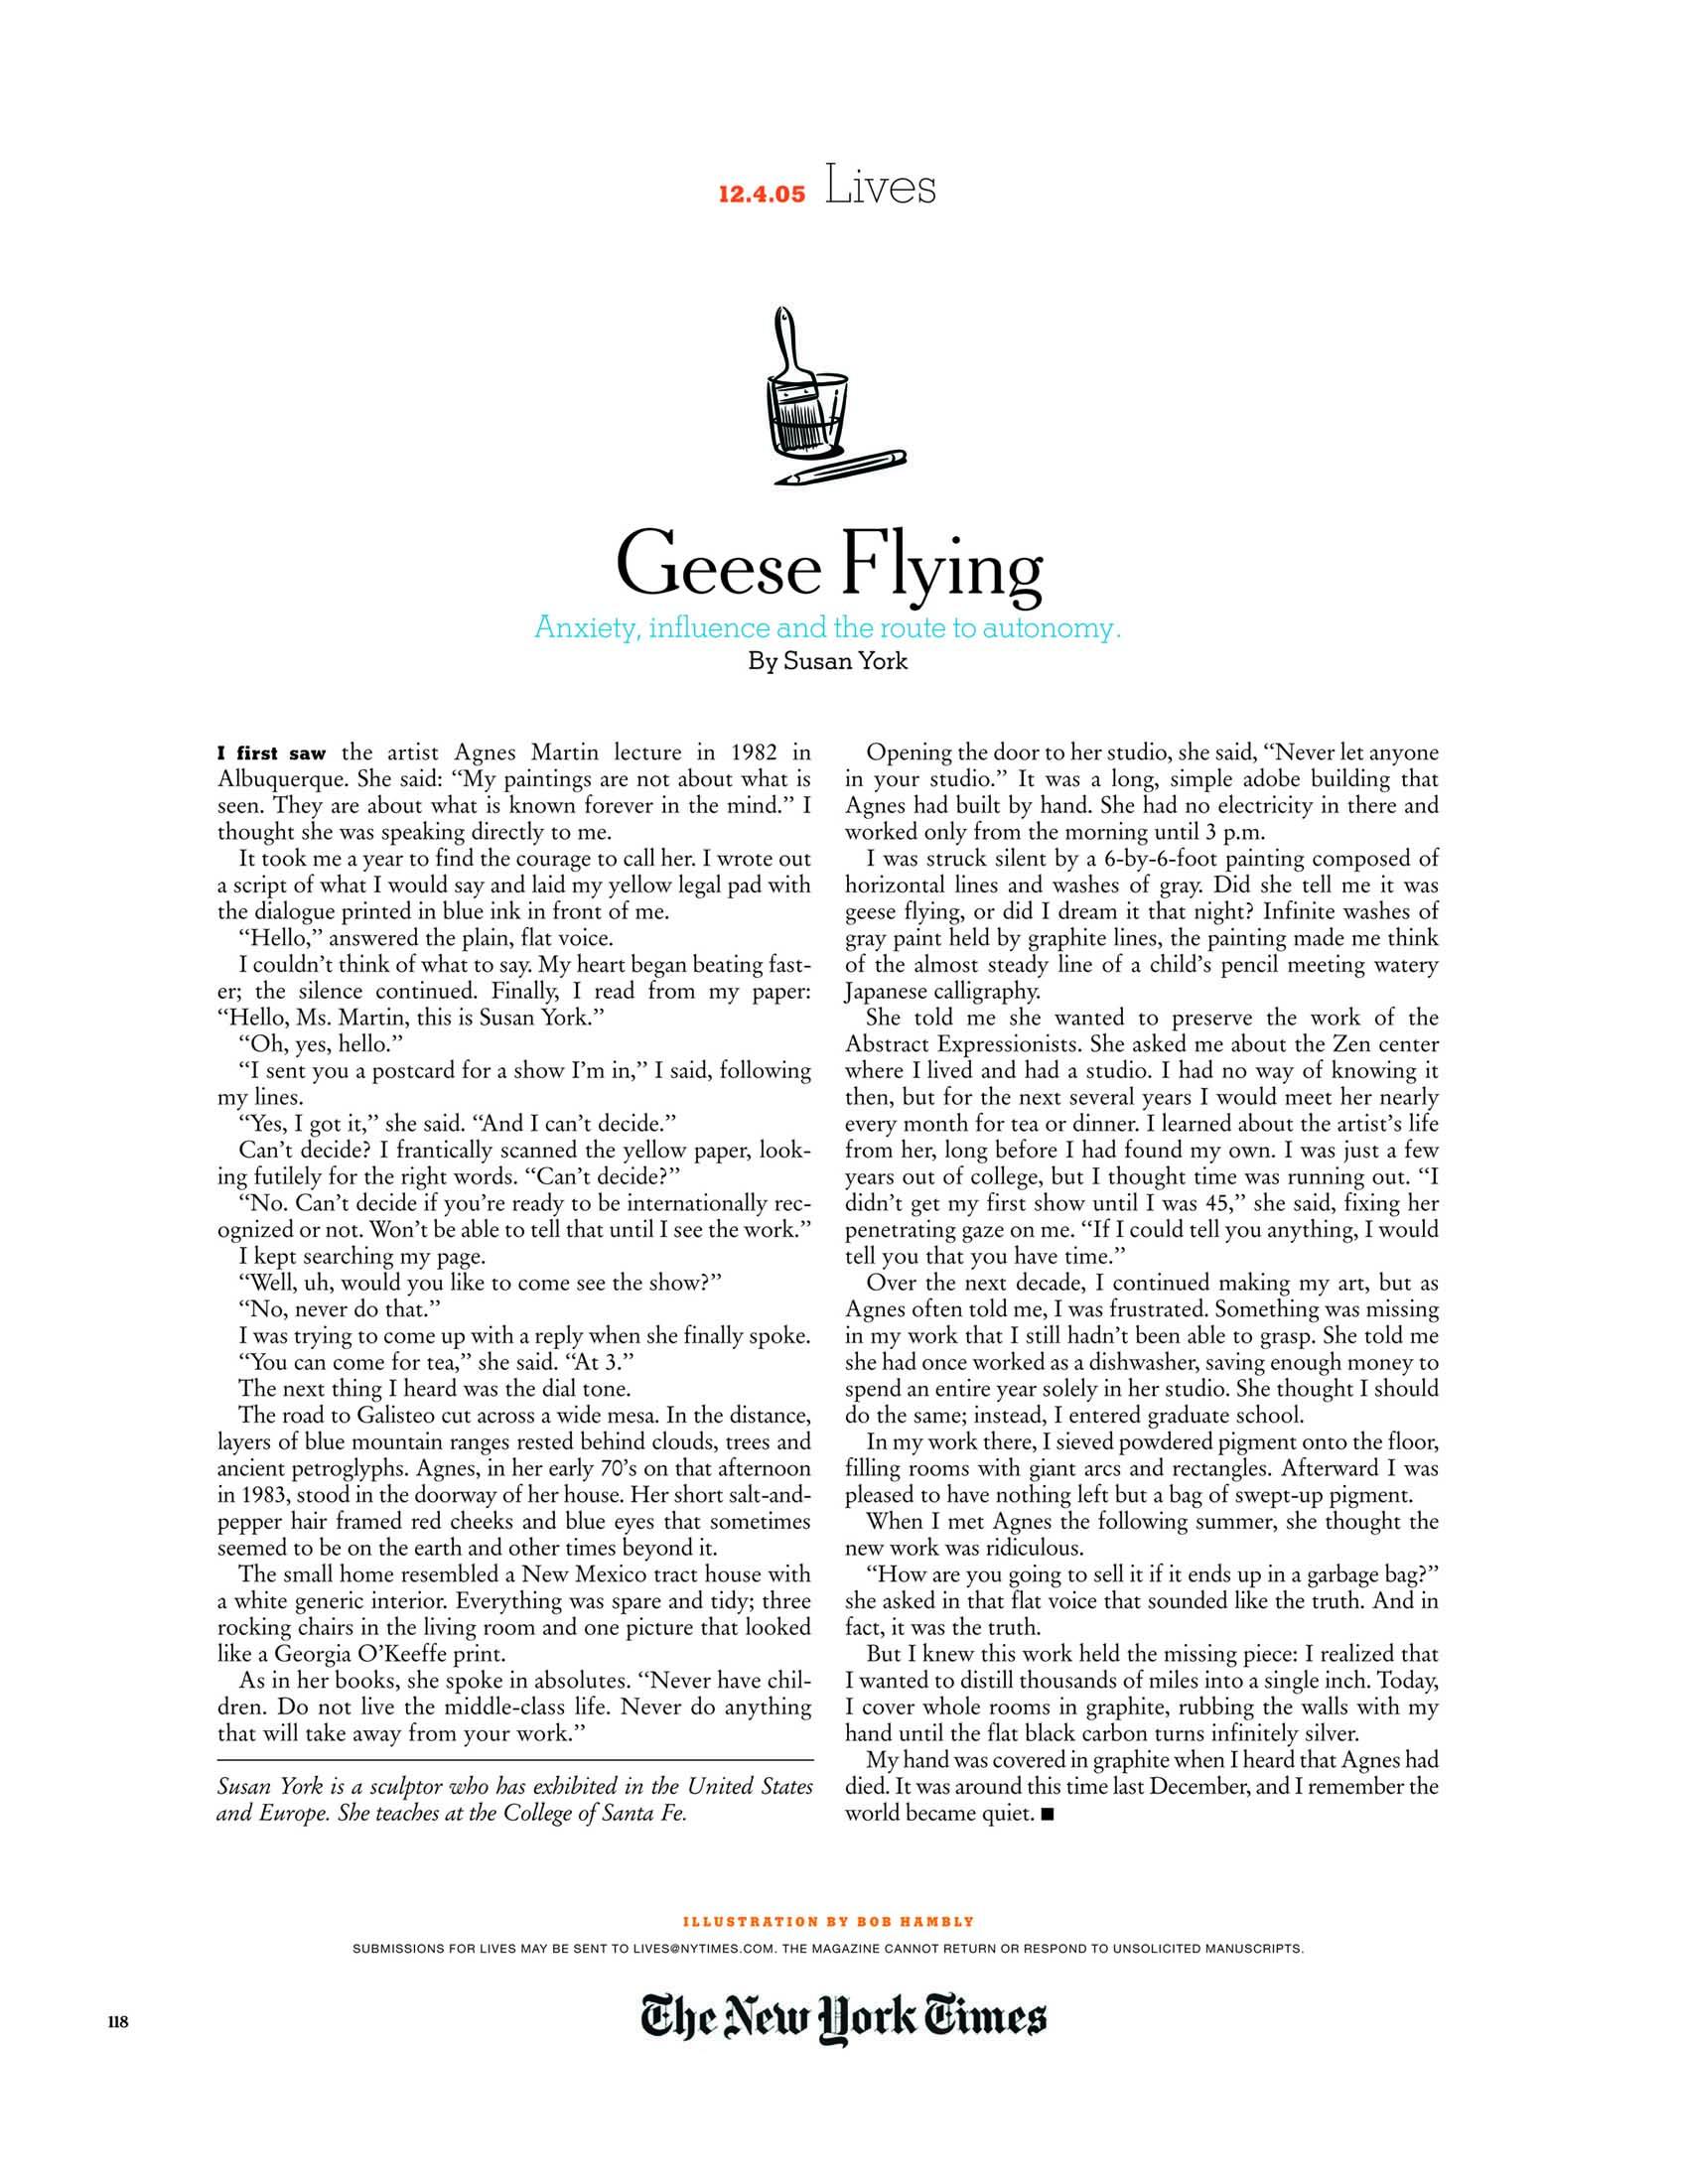 9.NYT Lives column by s york 12_05.jpg